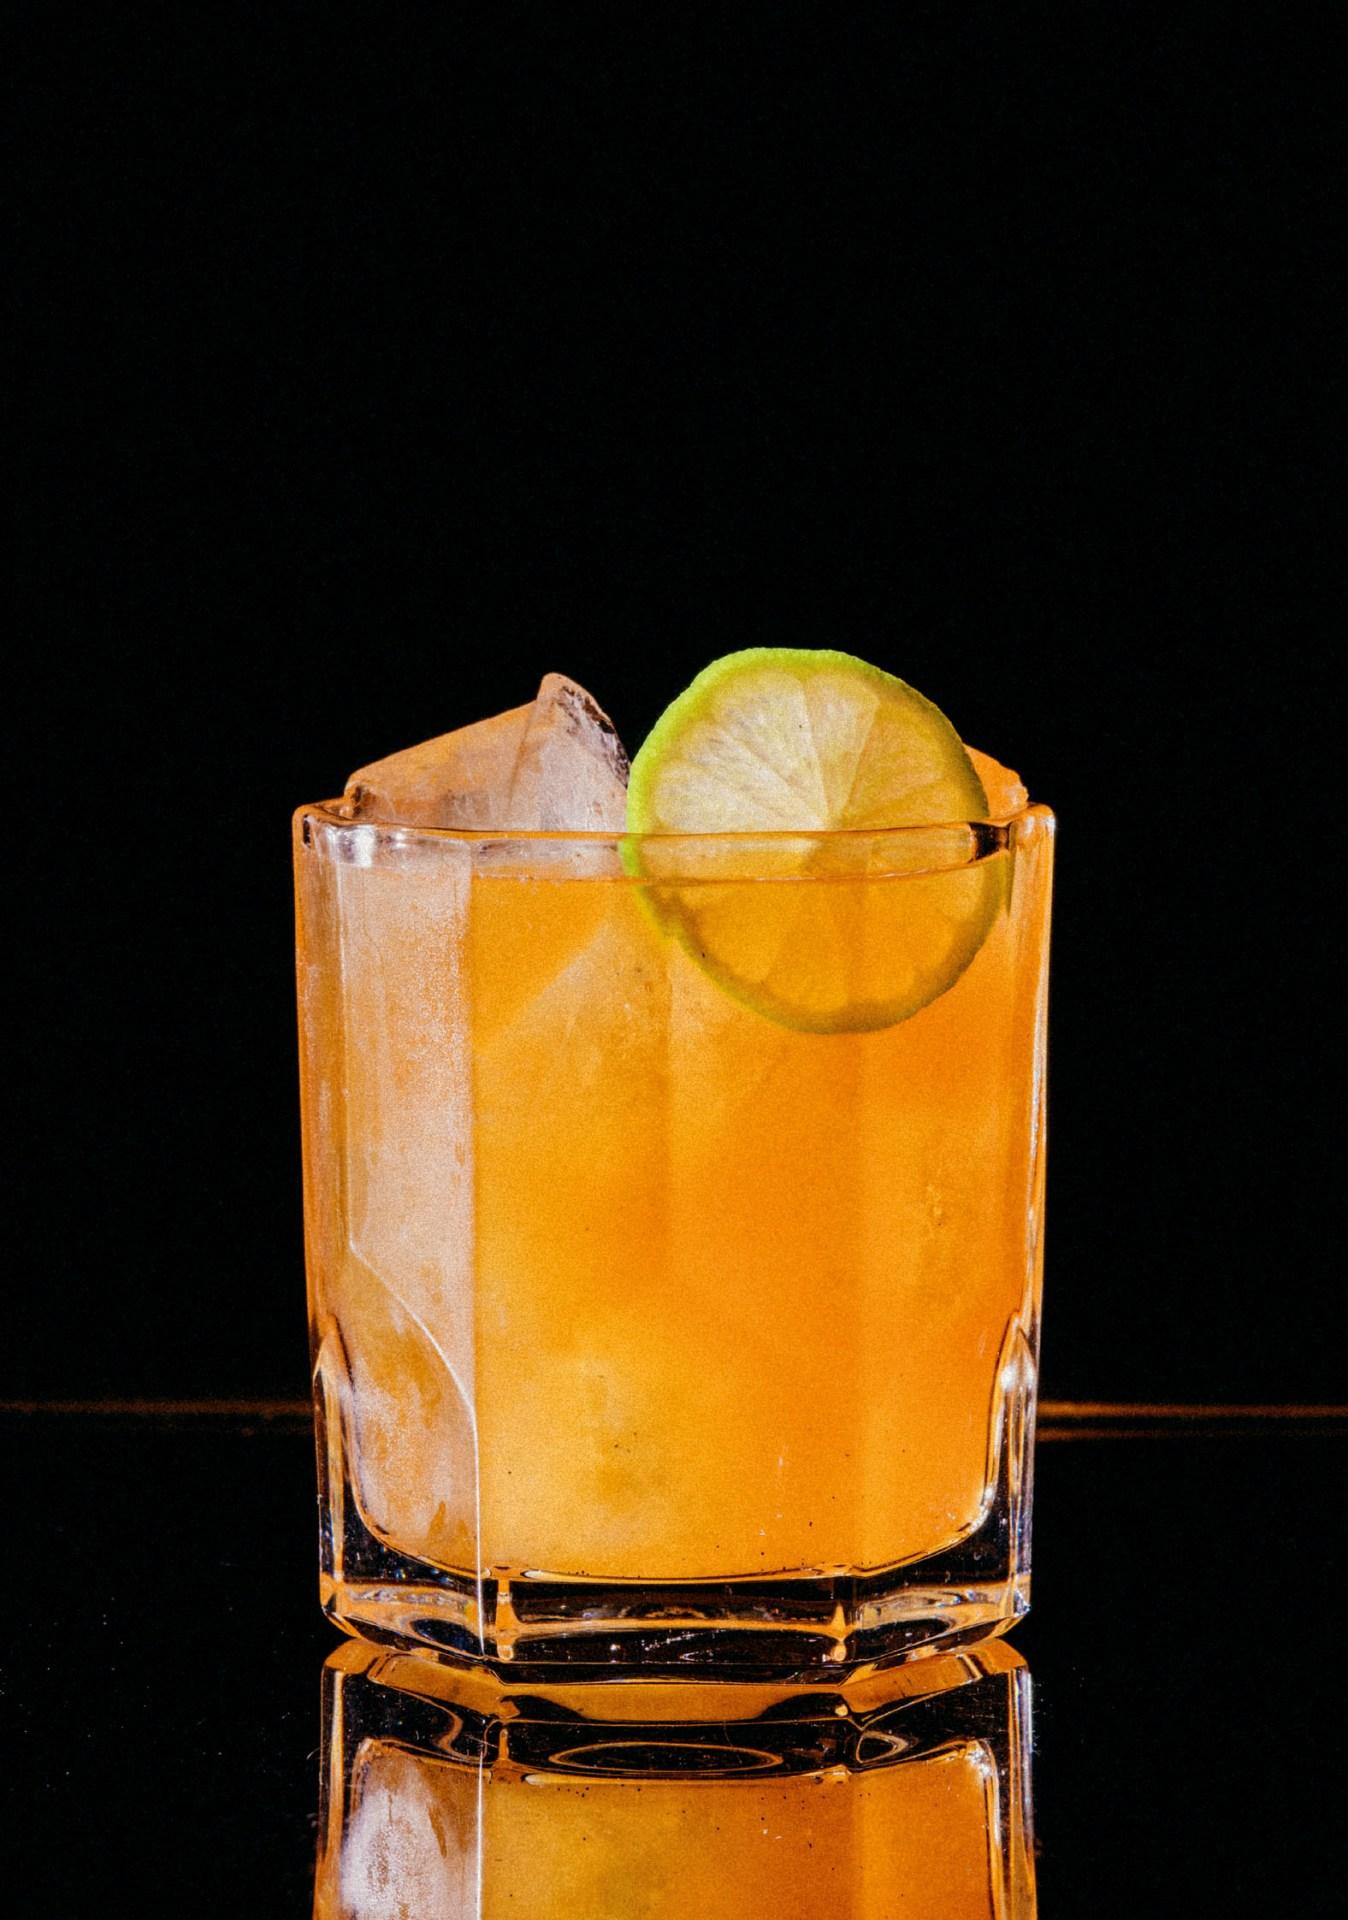 Recipe: 5cl Havana Club Añejo 7 Años 3cl Old Judge Falernum 2cl Lime Juice 5 Dashes Angostura Bitters Lime